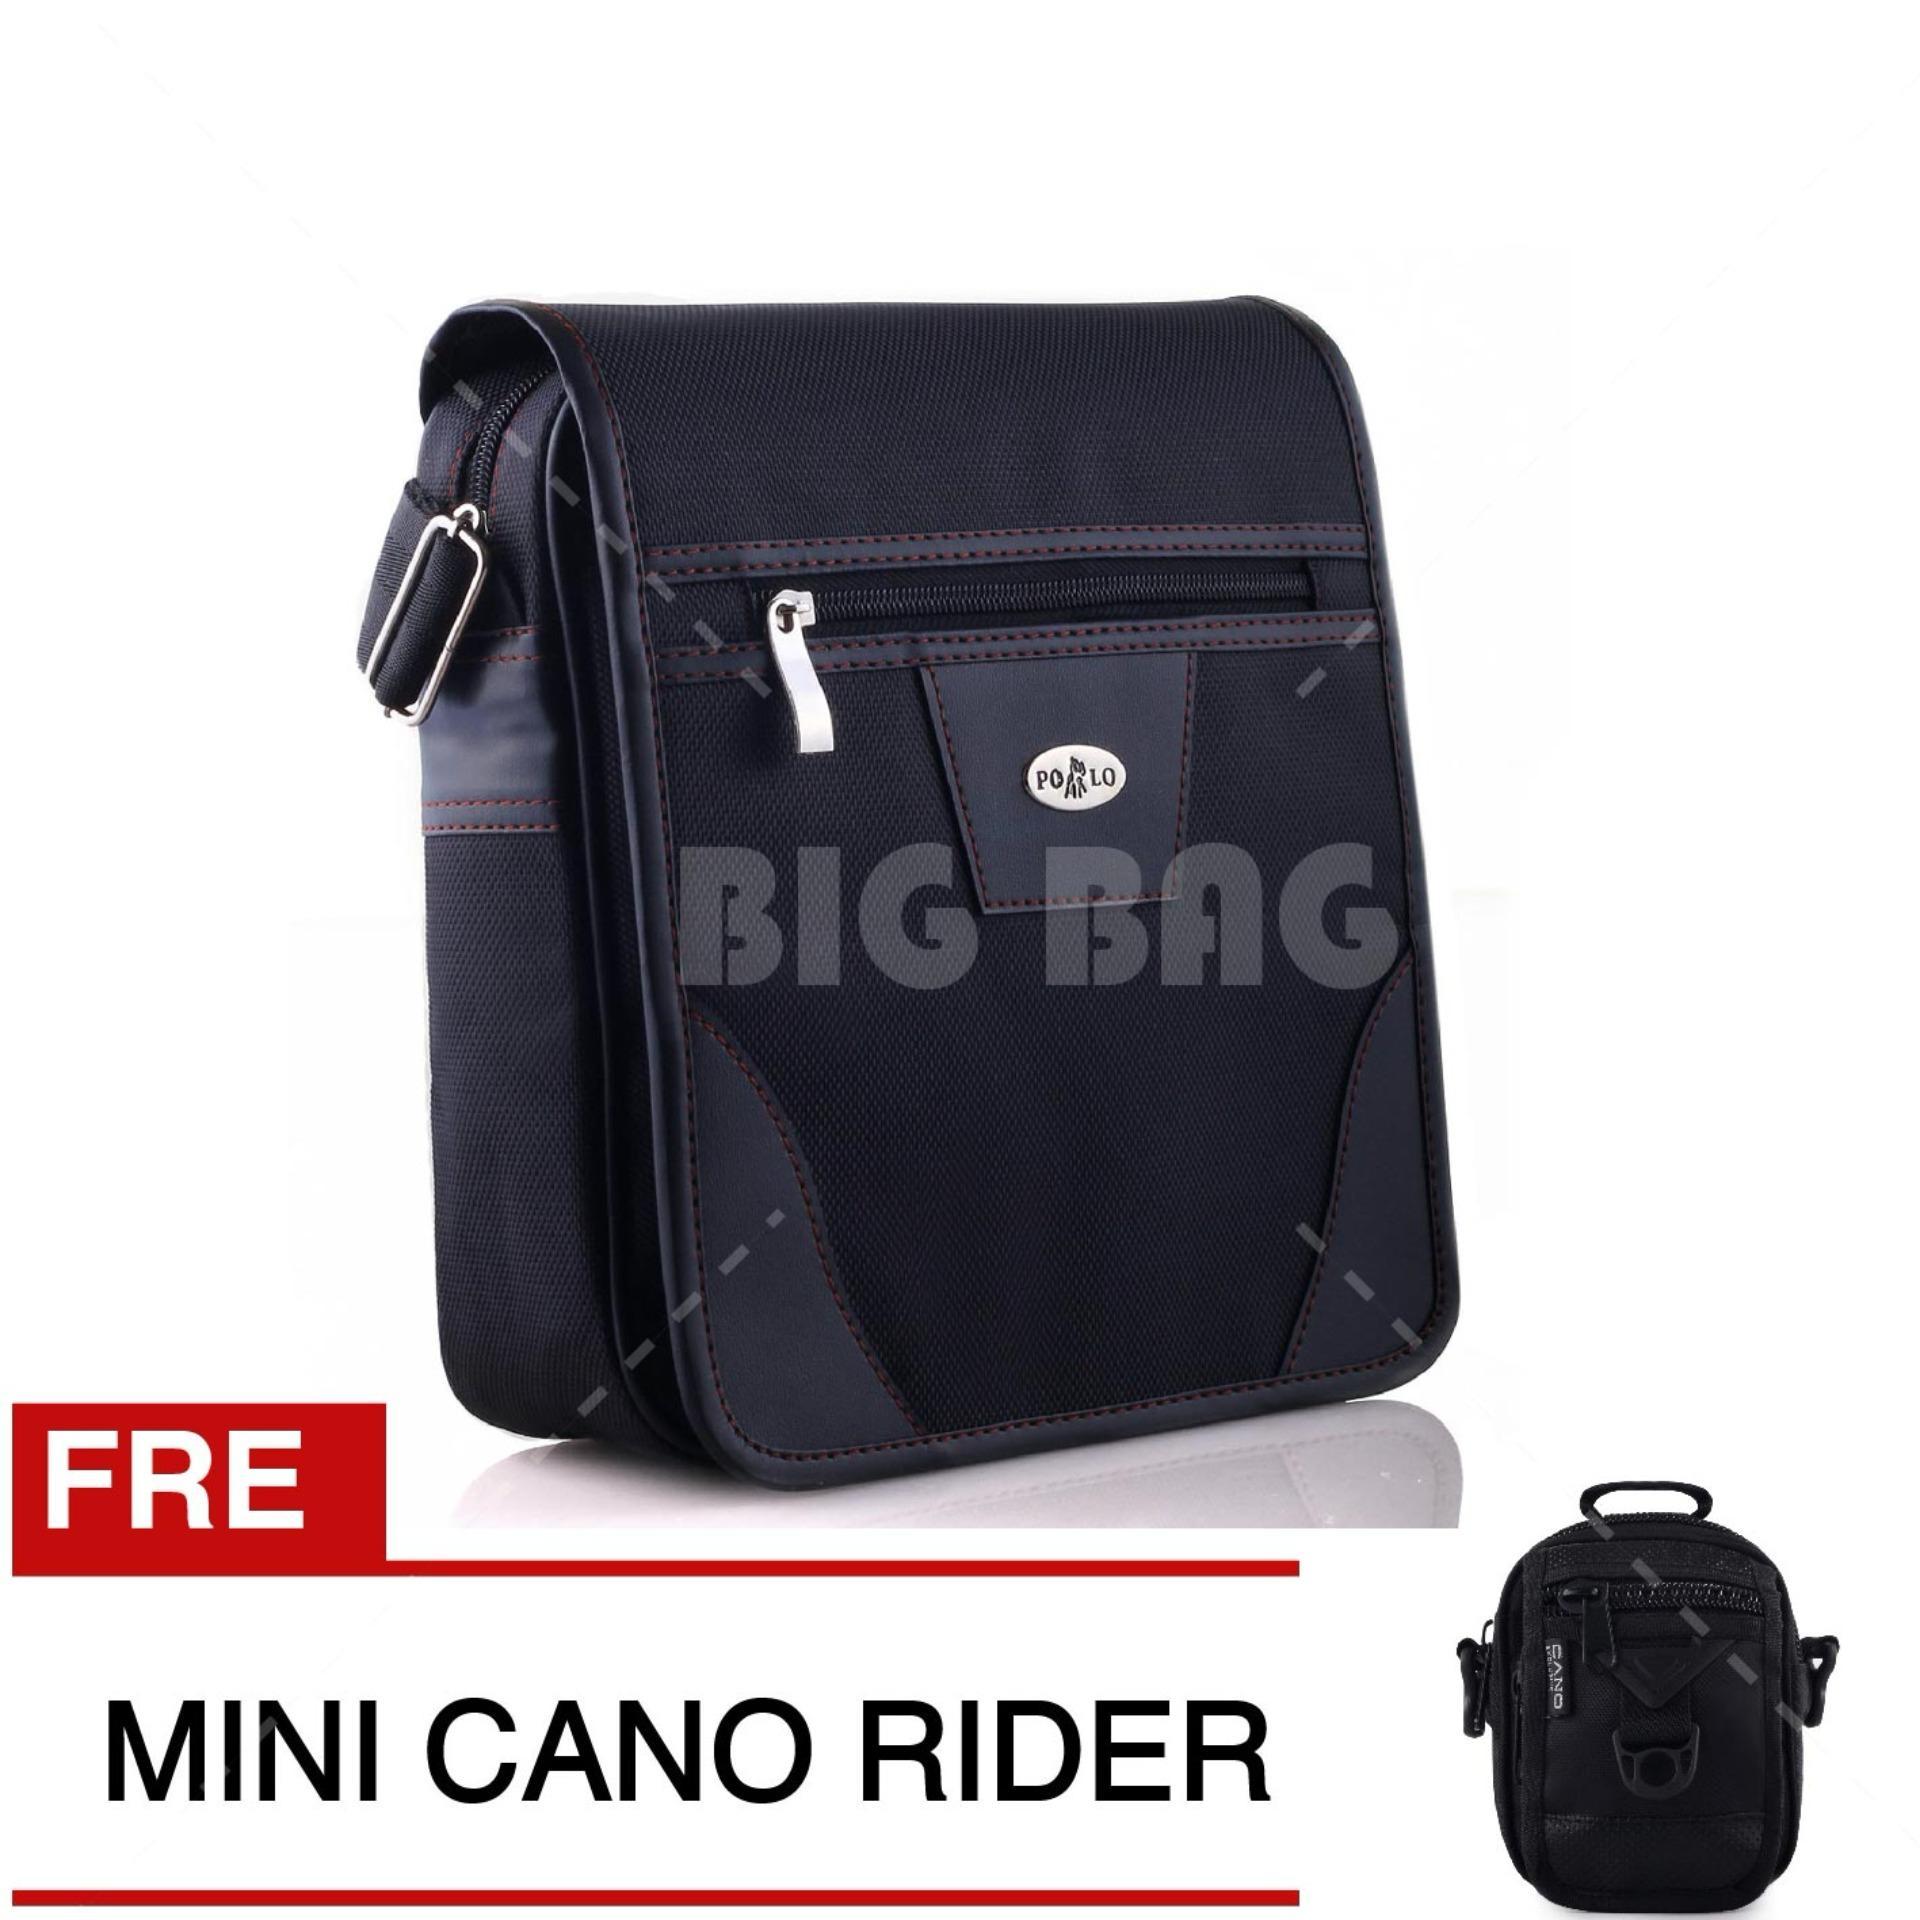 Tas Selempang Pria Wanita Polo USA Harbour Black HR01 FREE Tas Mini Cano